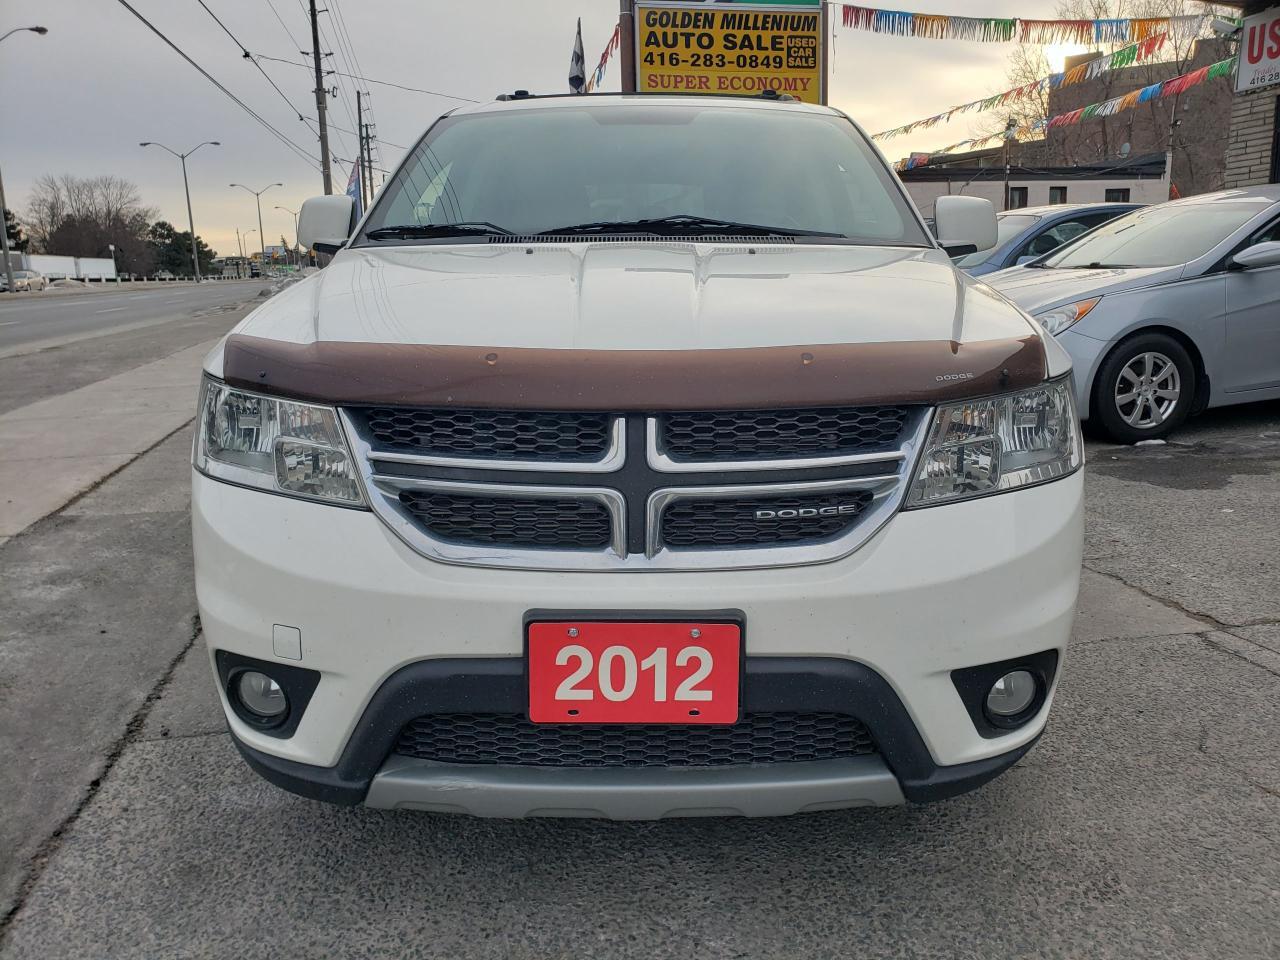 2012 Dodge Journey SXT / 7 Seats -Only 157K-Mint Condition-Bluetooth